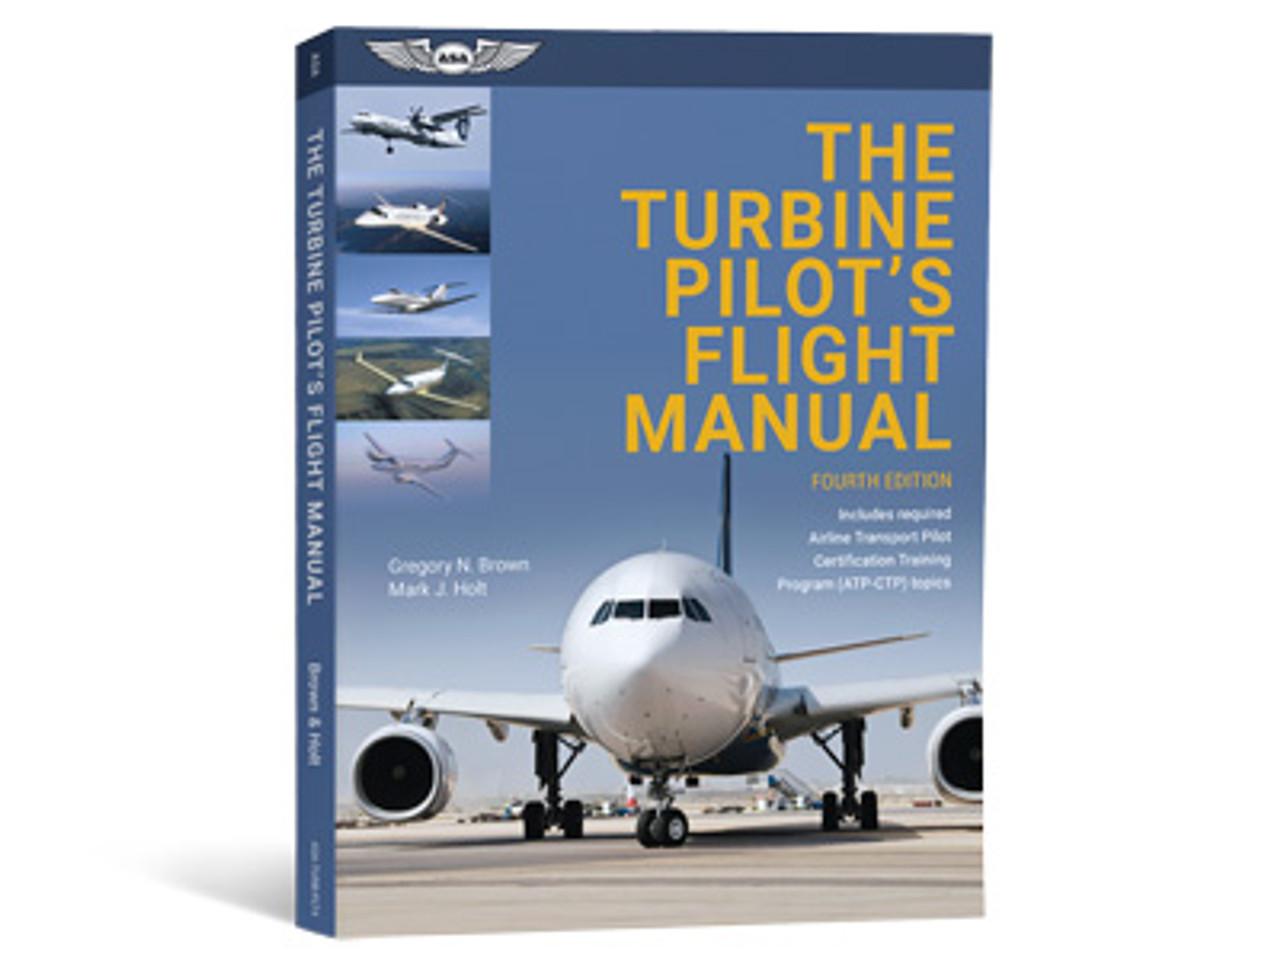 ASA Turbine Pilot's Flight Manual 4th Edition